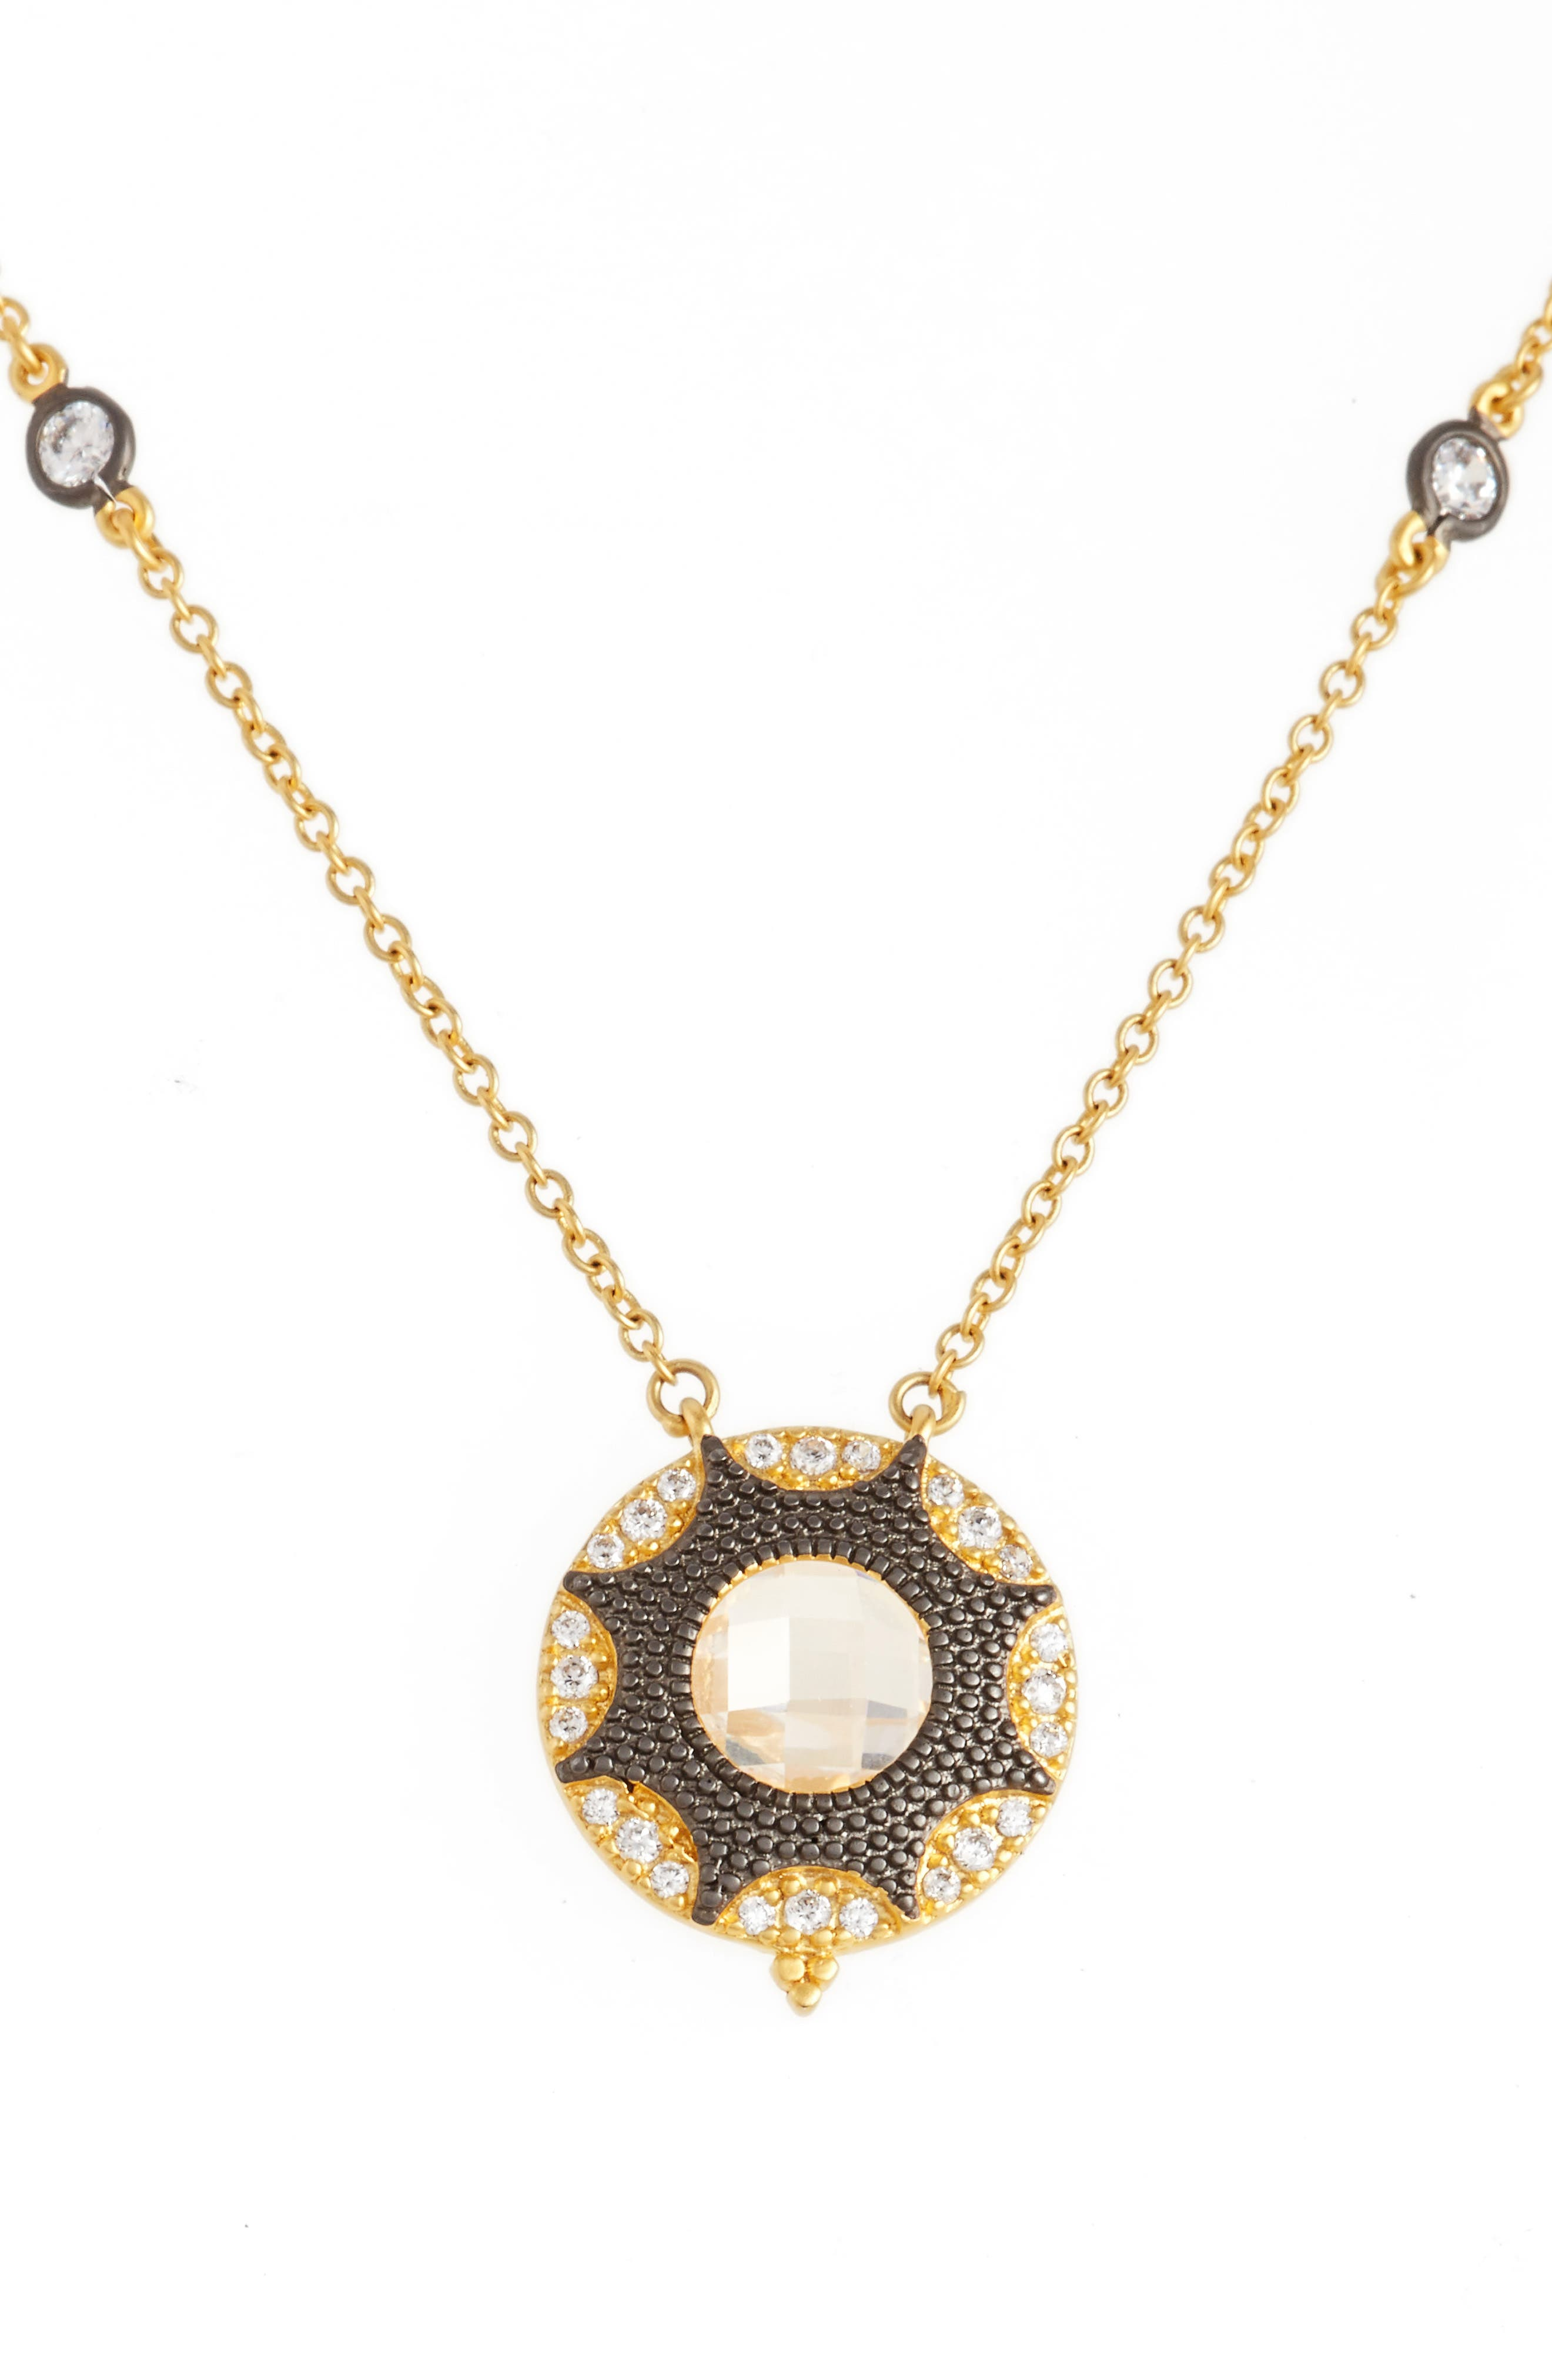 FREIDA ROTHMAN Round Pendant Necklace